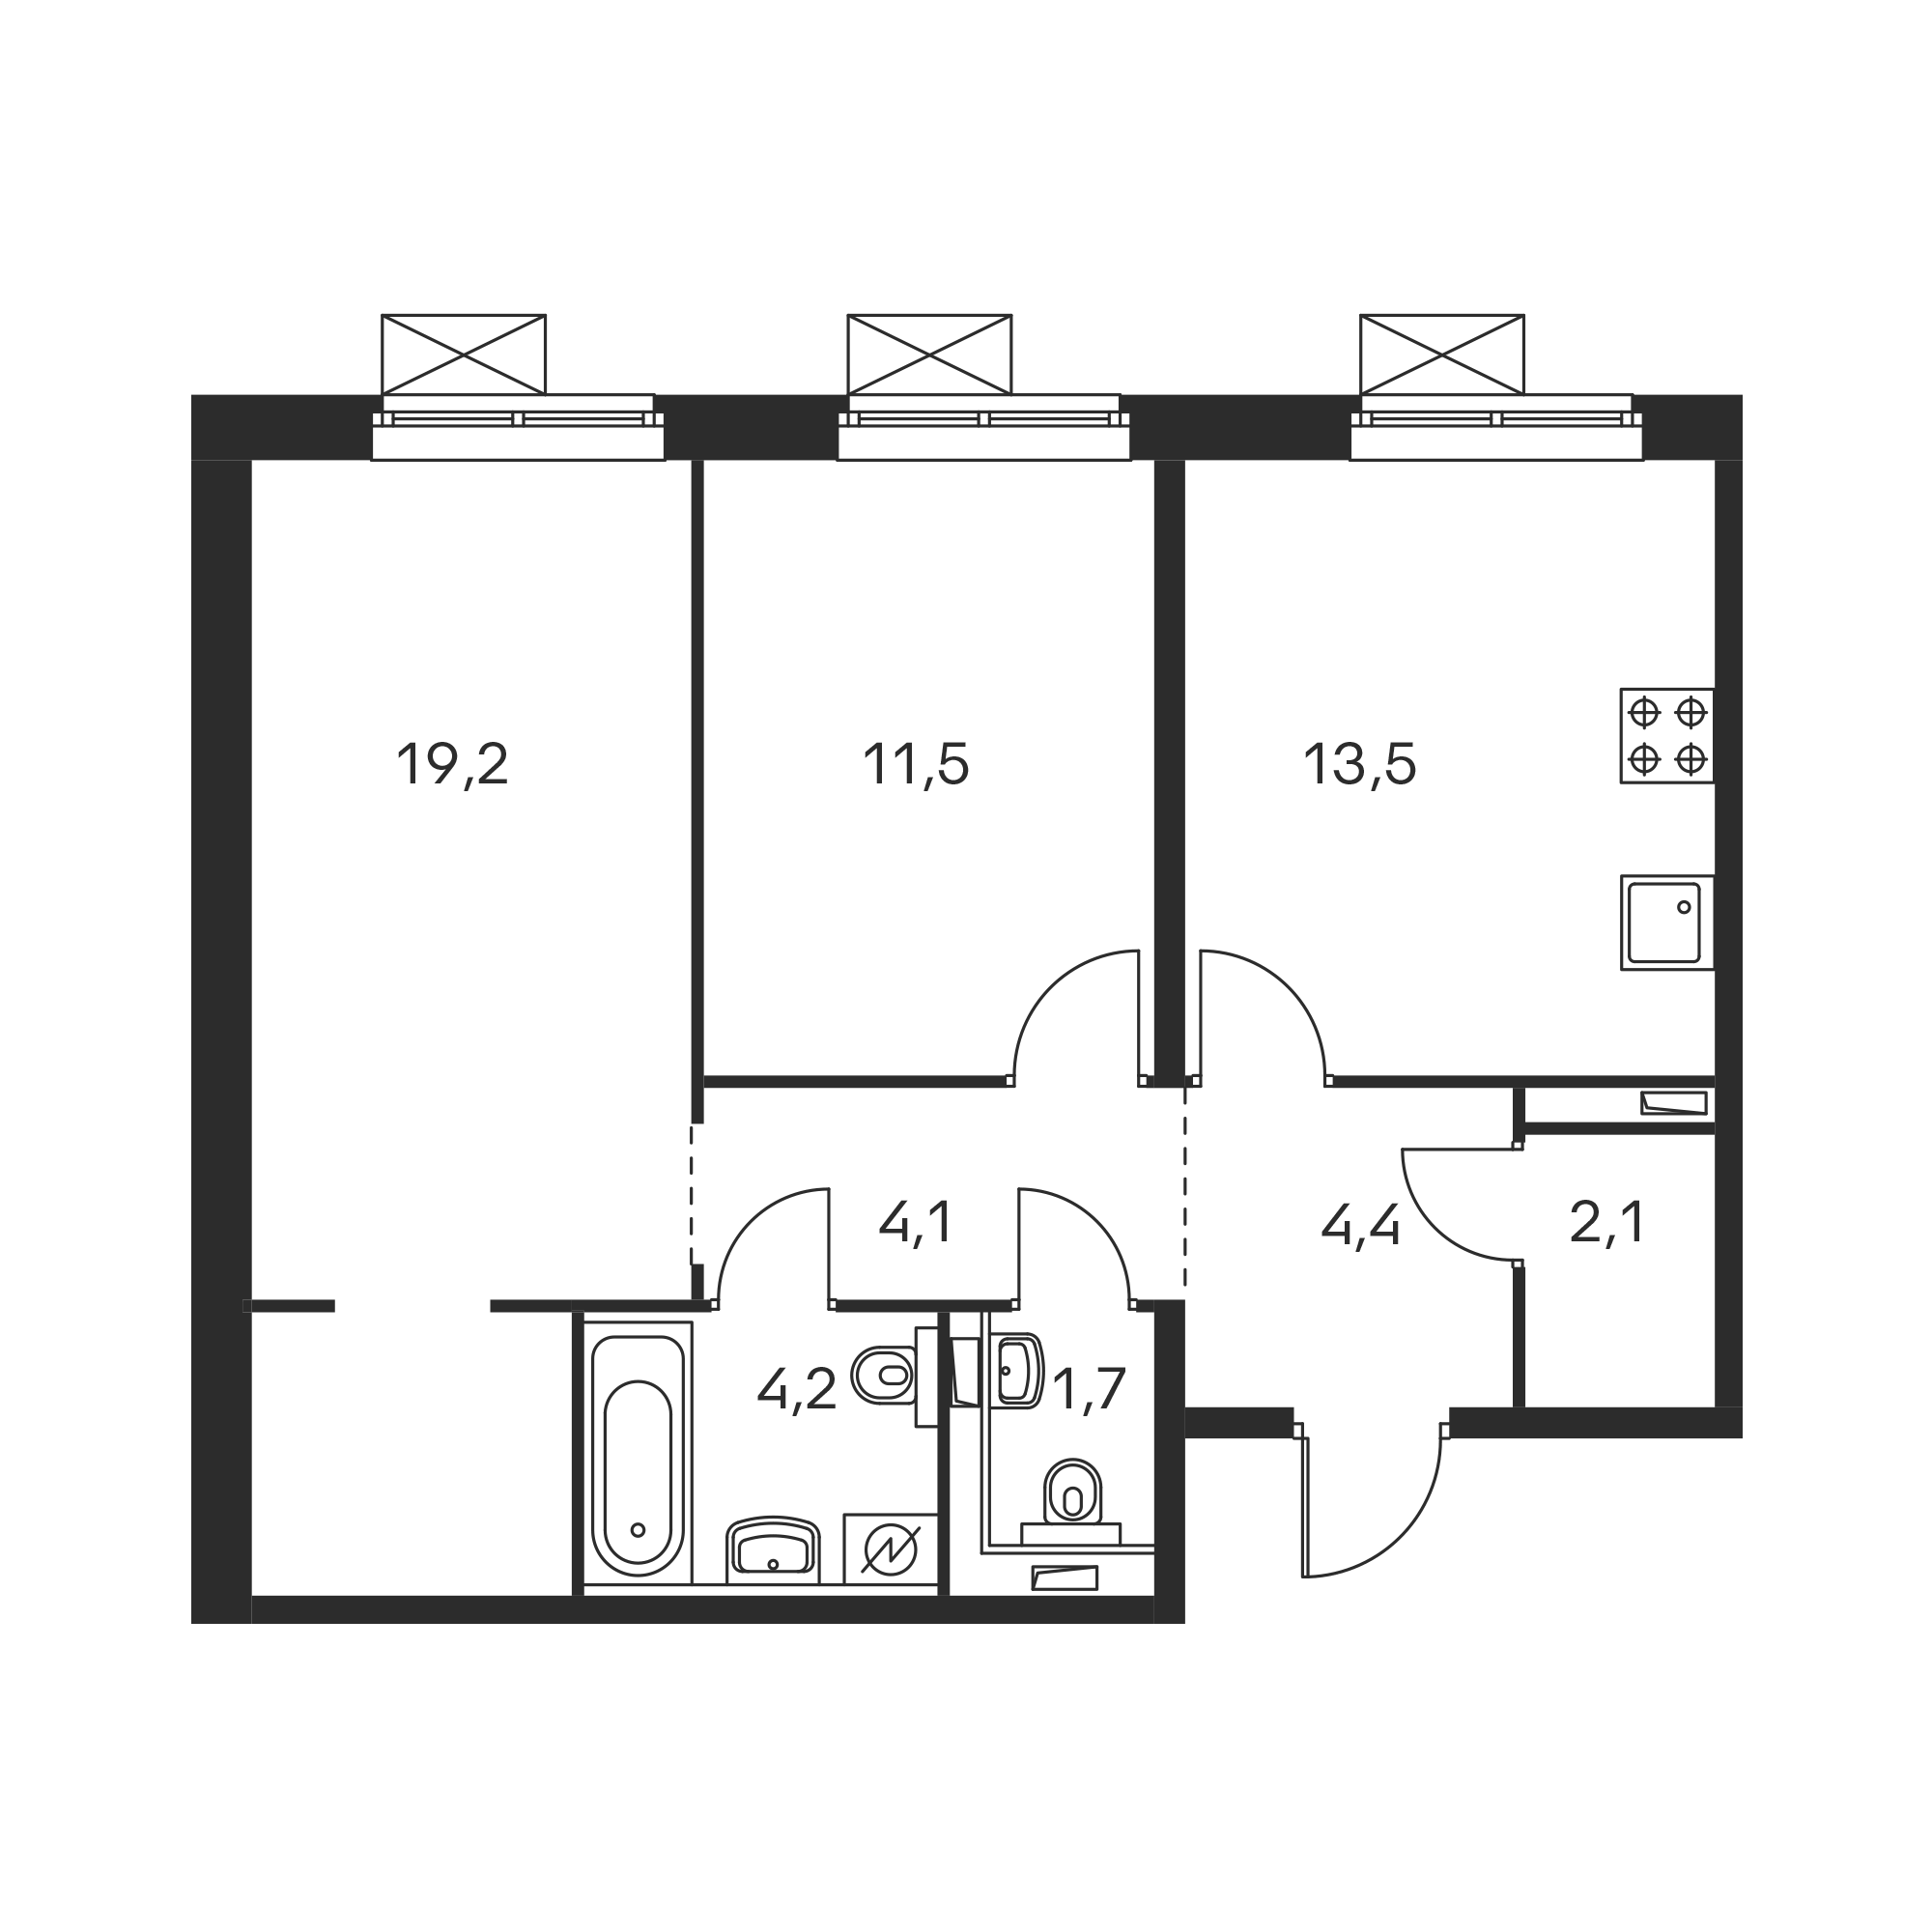 2KM4_9.6-1_S_Z-8